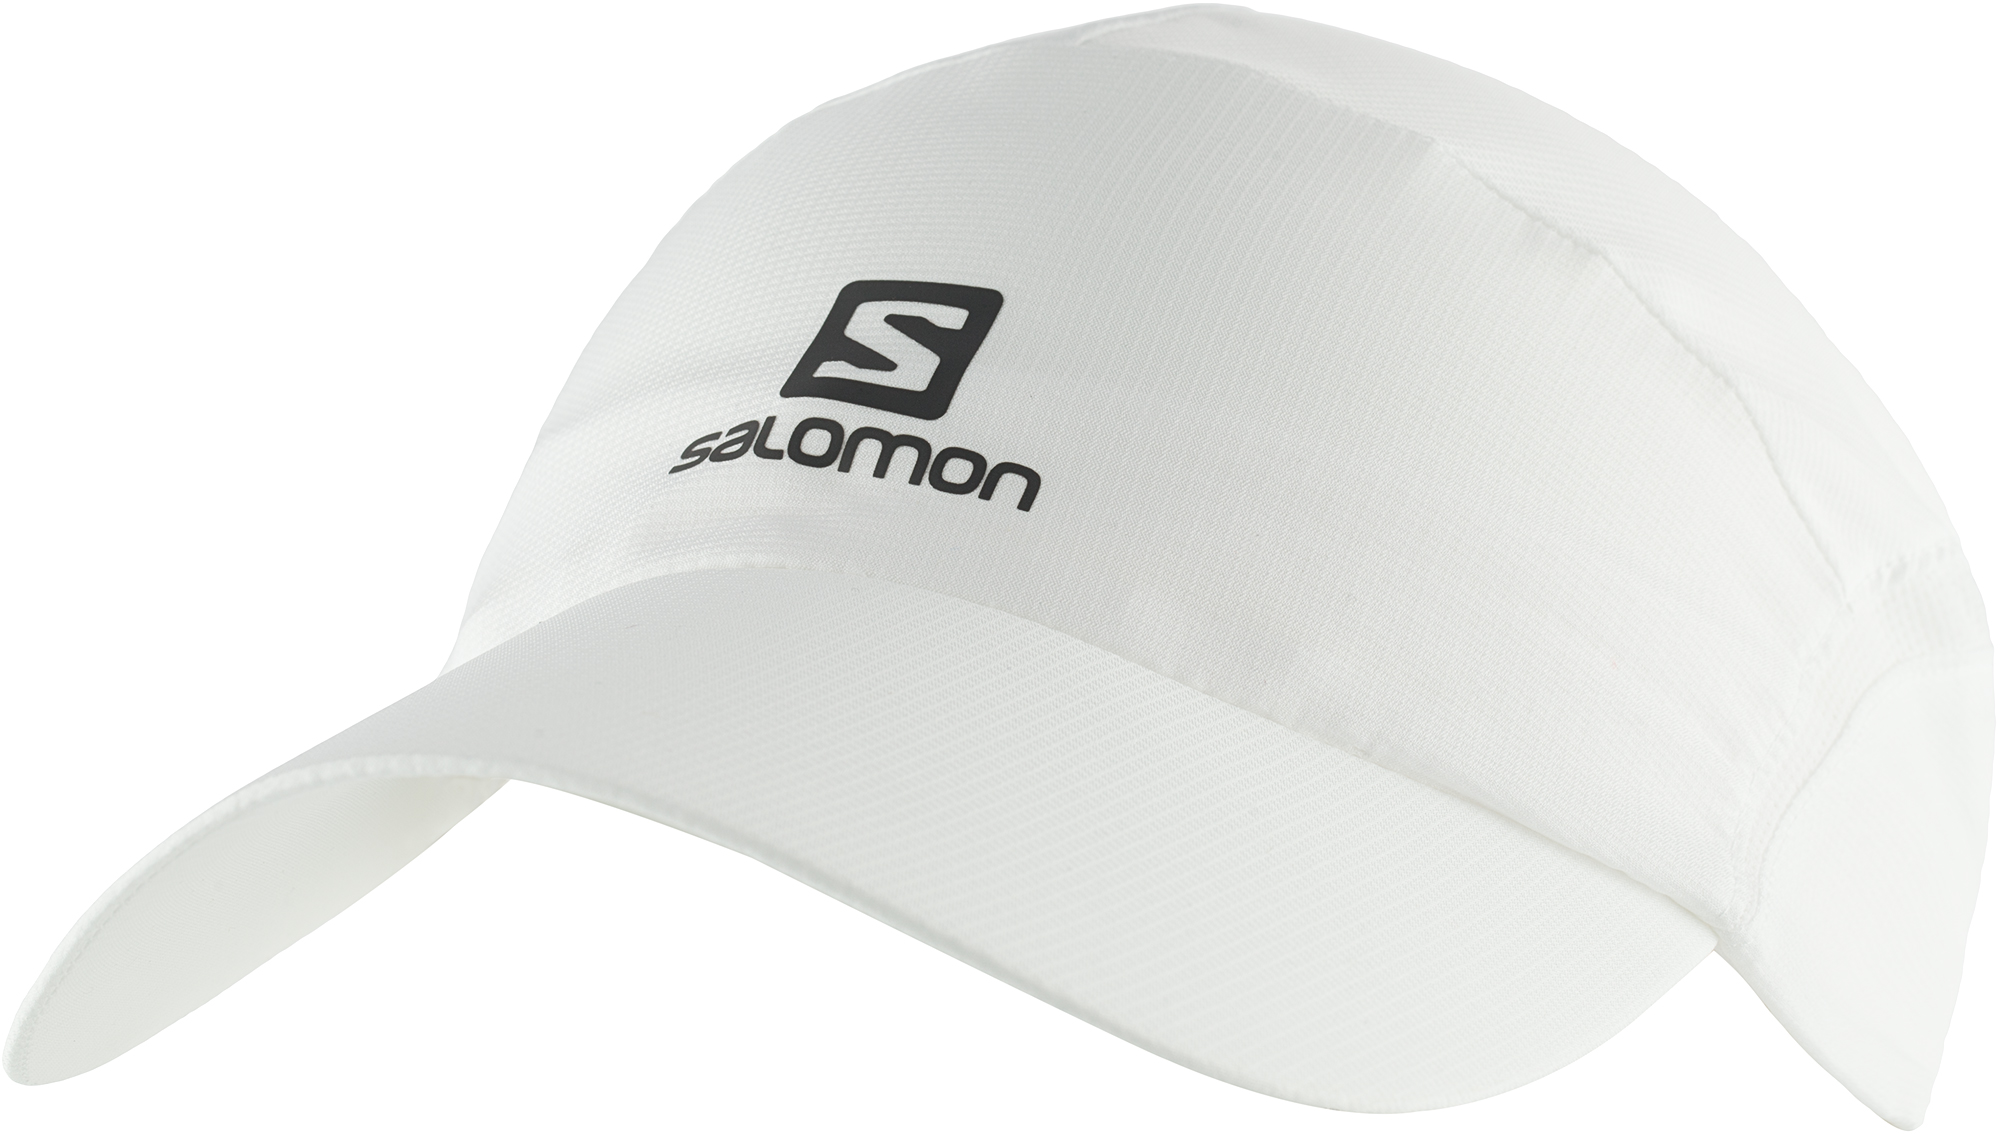 Salomon Бейсболка Salomon Xa, размер 59-61